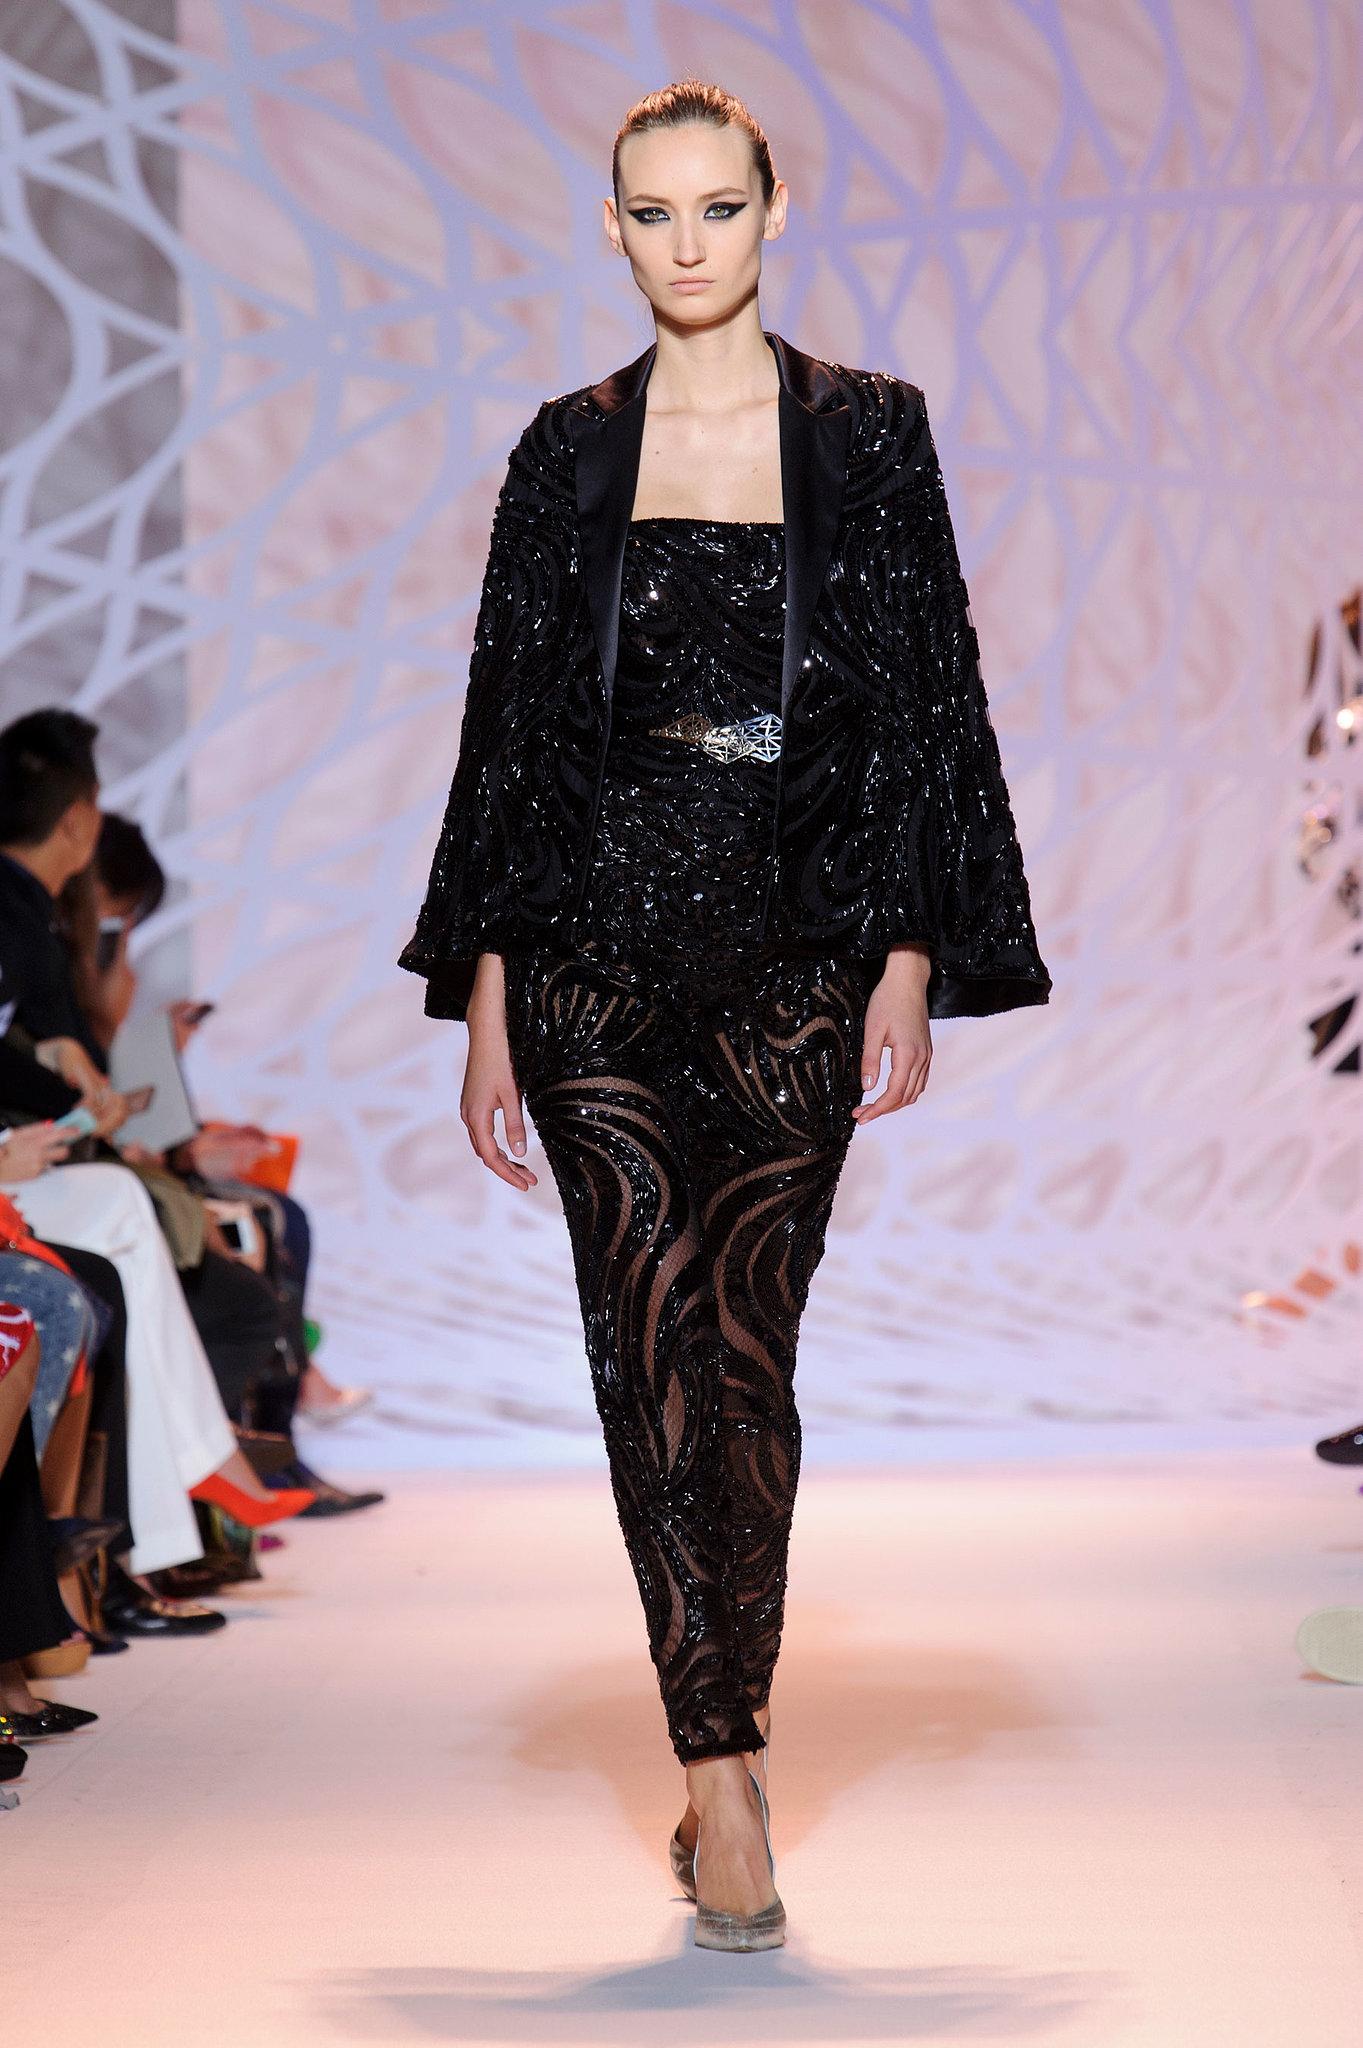 Zuhair-Murad-Haute-Couture-Fall-2014 (5)